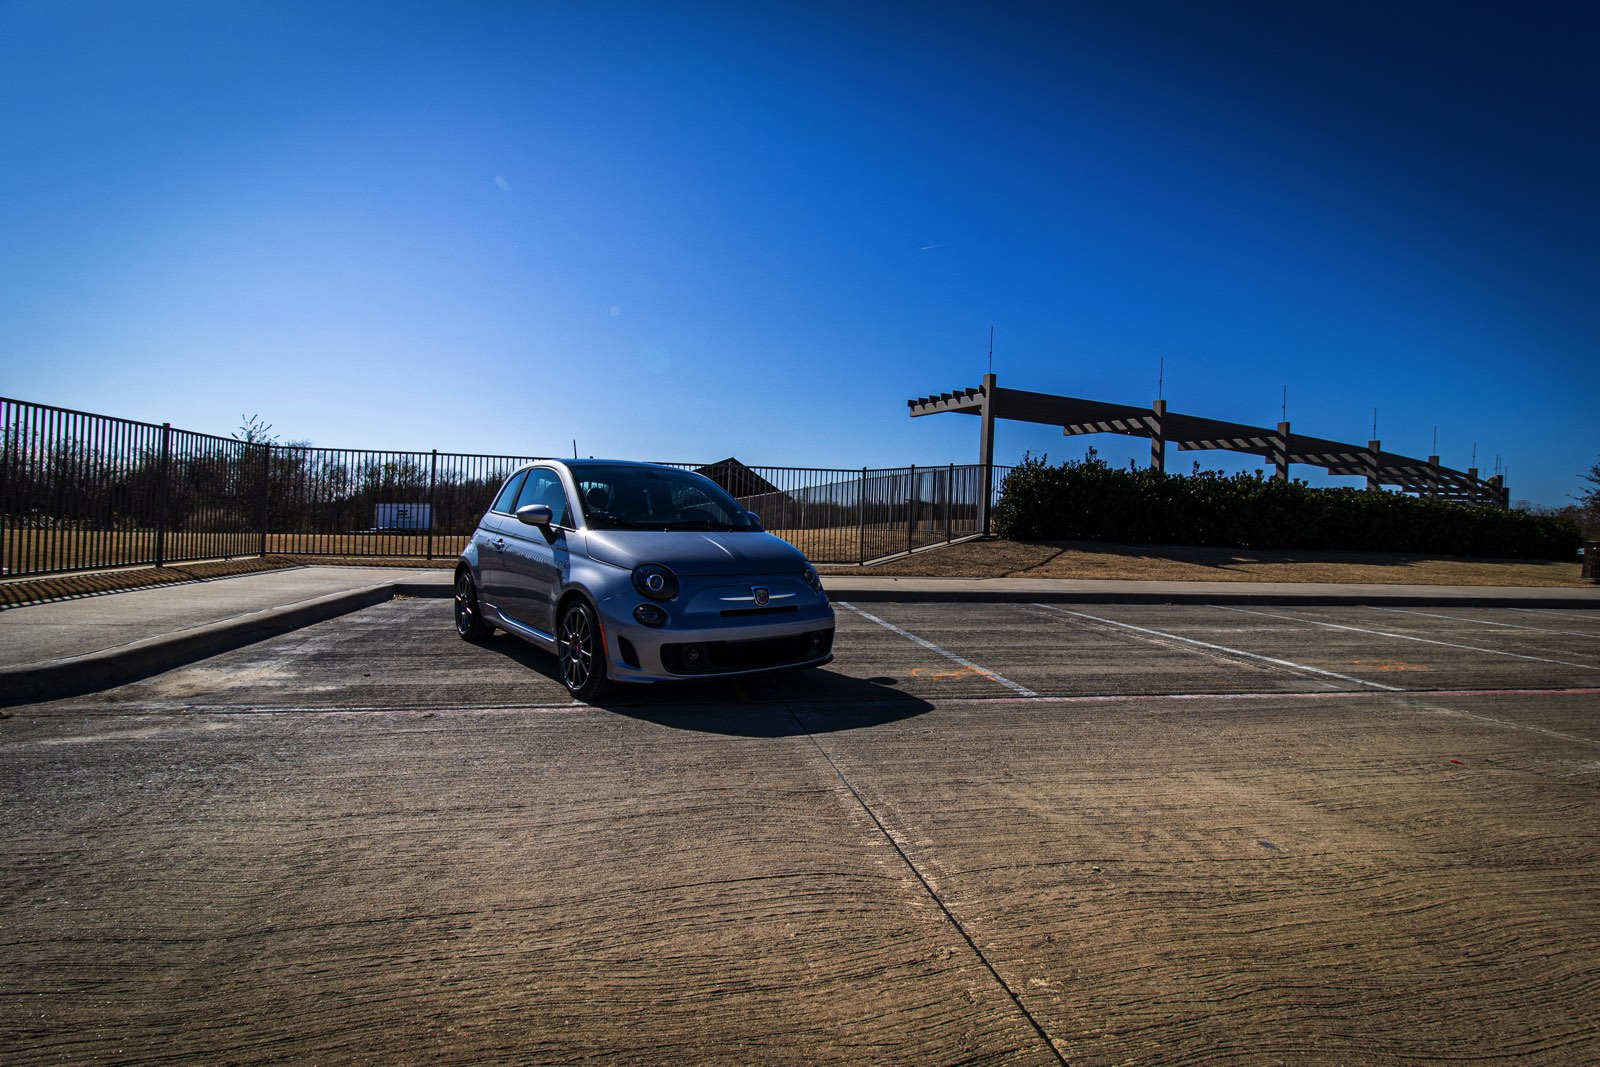 2019-Fiat-500-Abarth–txgarage–001